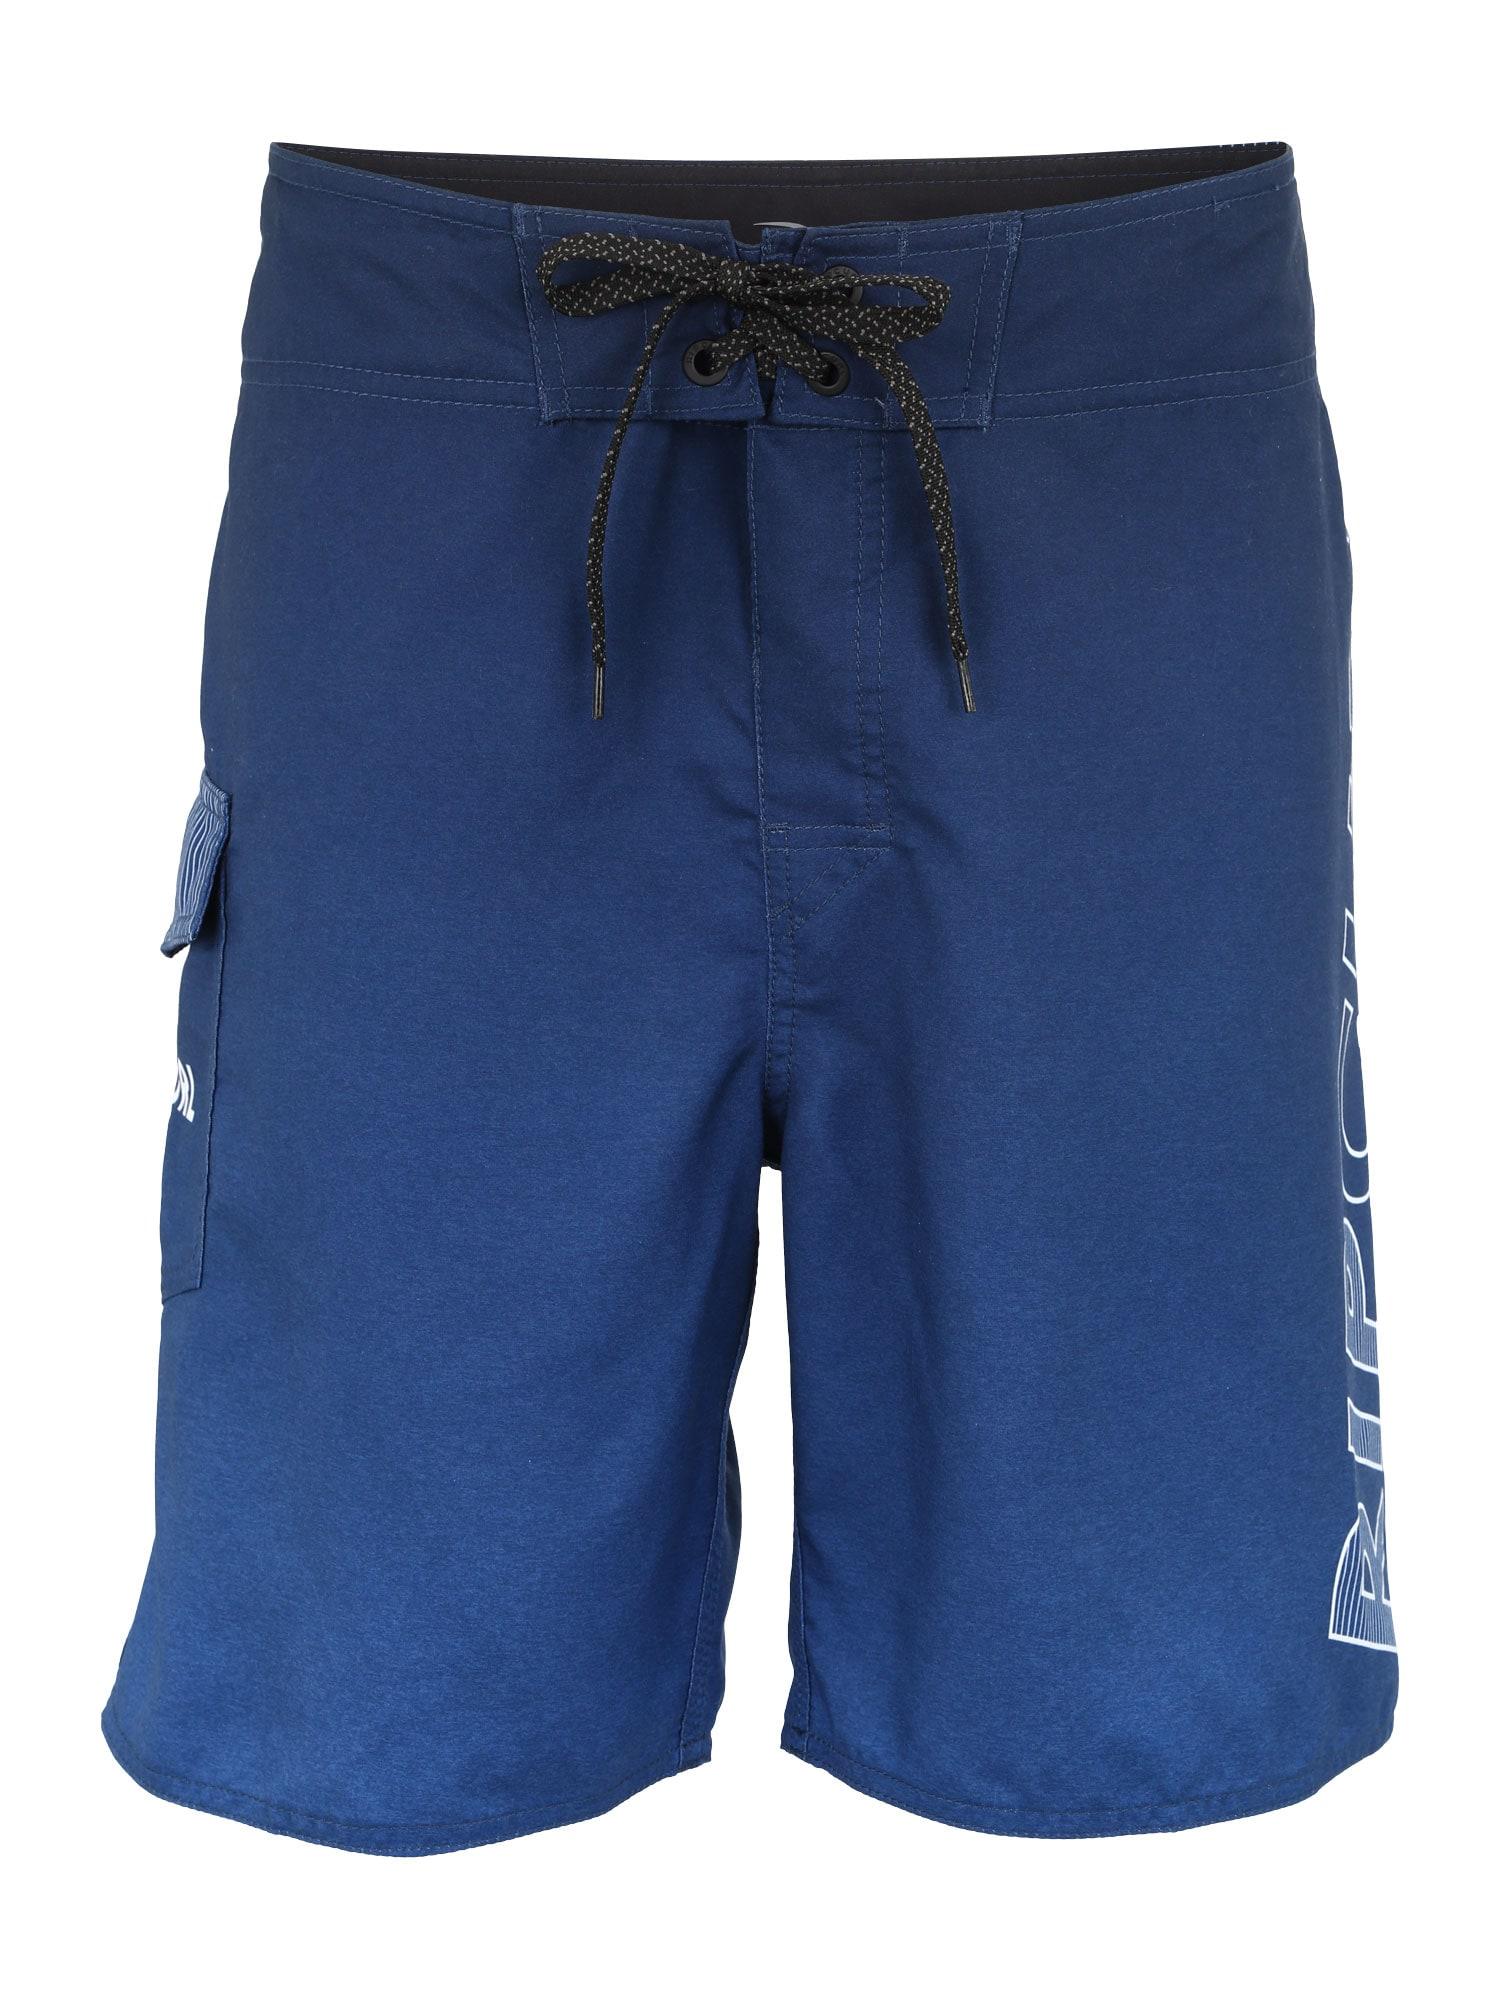 Badeshorts 'UNDERTOW 20' | Bekleidung > Bademode > Badeshorts | Blau | Rip Curl